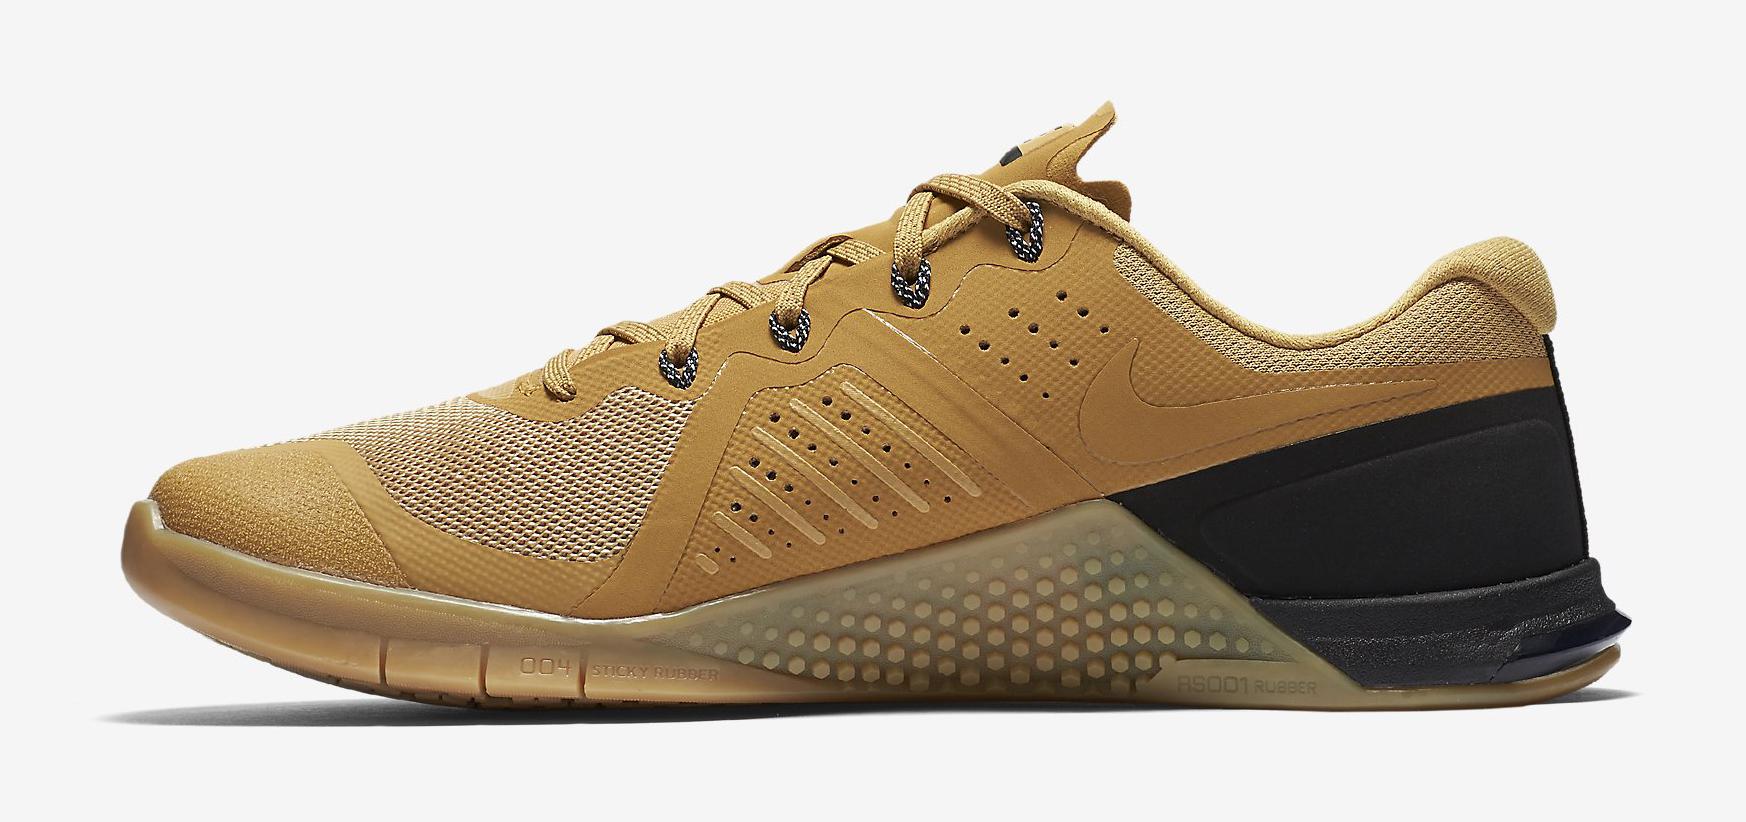 Nike Metcon 2 Wheat 819899-702 Medial